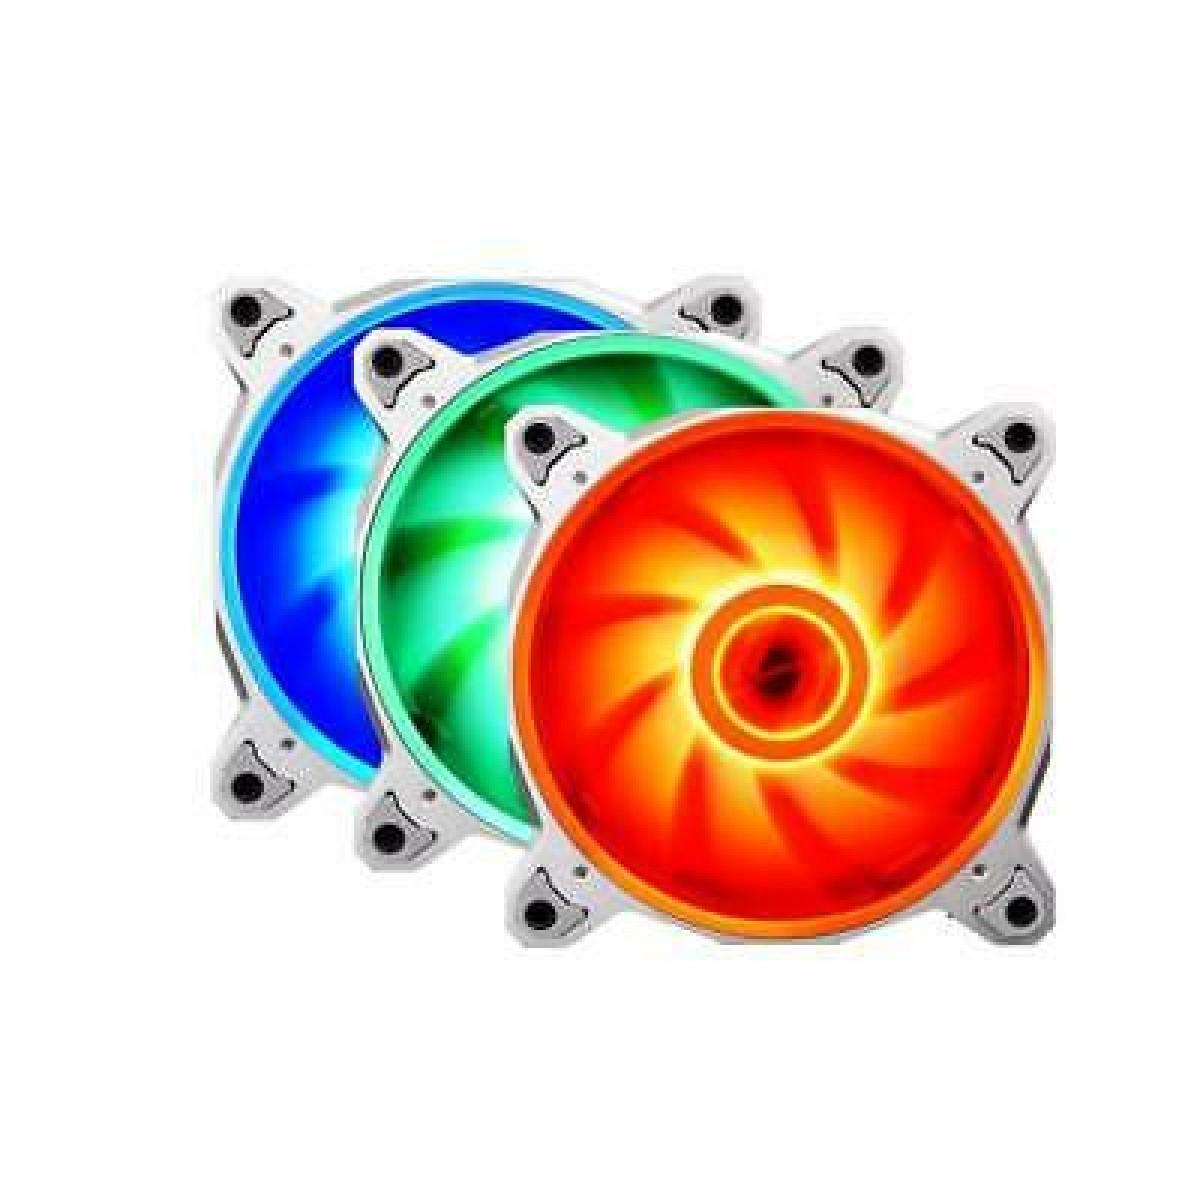 Kit Fan com 3 Unidades Lian Li Bora BR Lite RGB 120mm, Silver